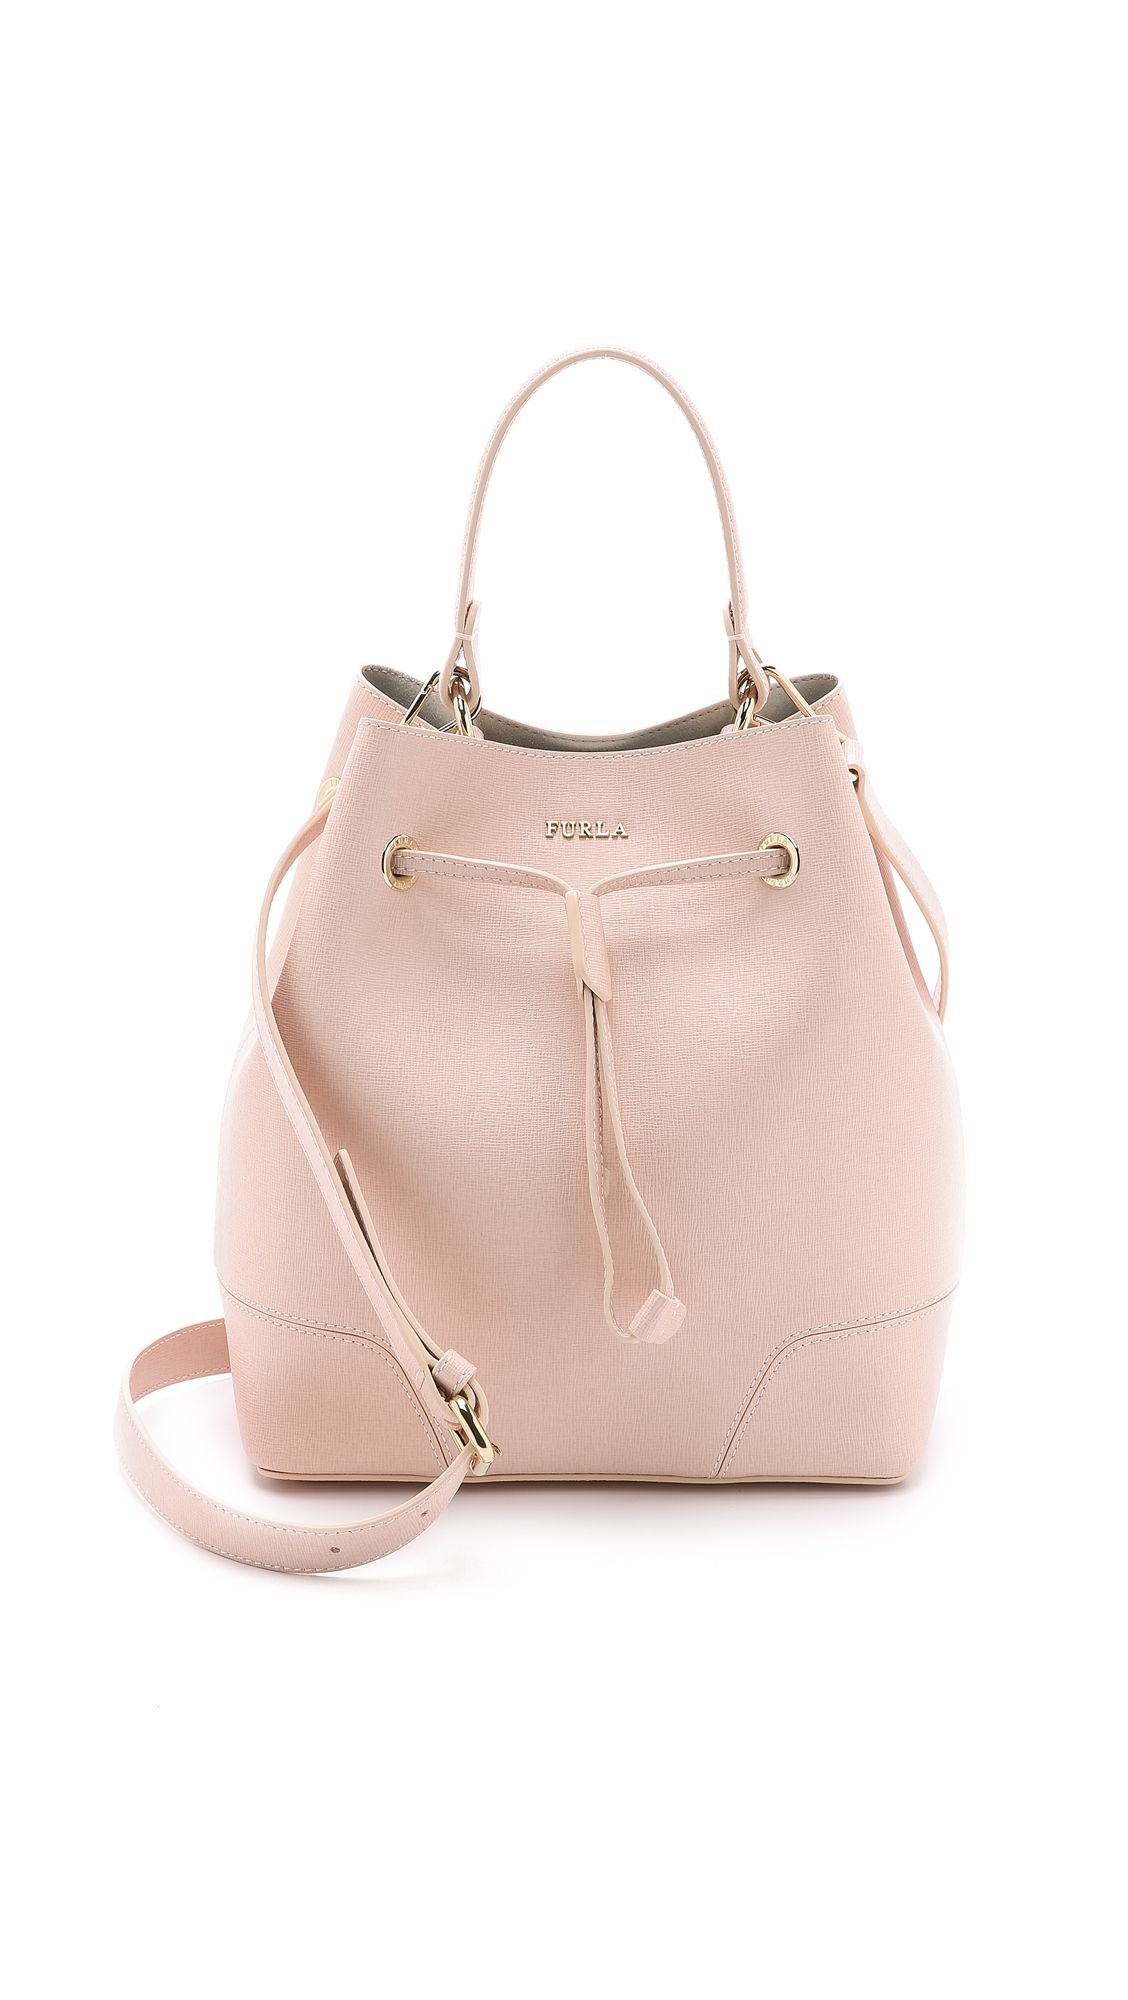 Shoulder Bag for Women On Sale, Hot Coral, Leather, 2017, one size Furla